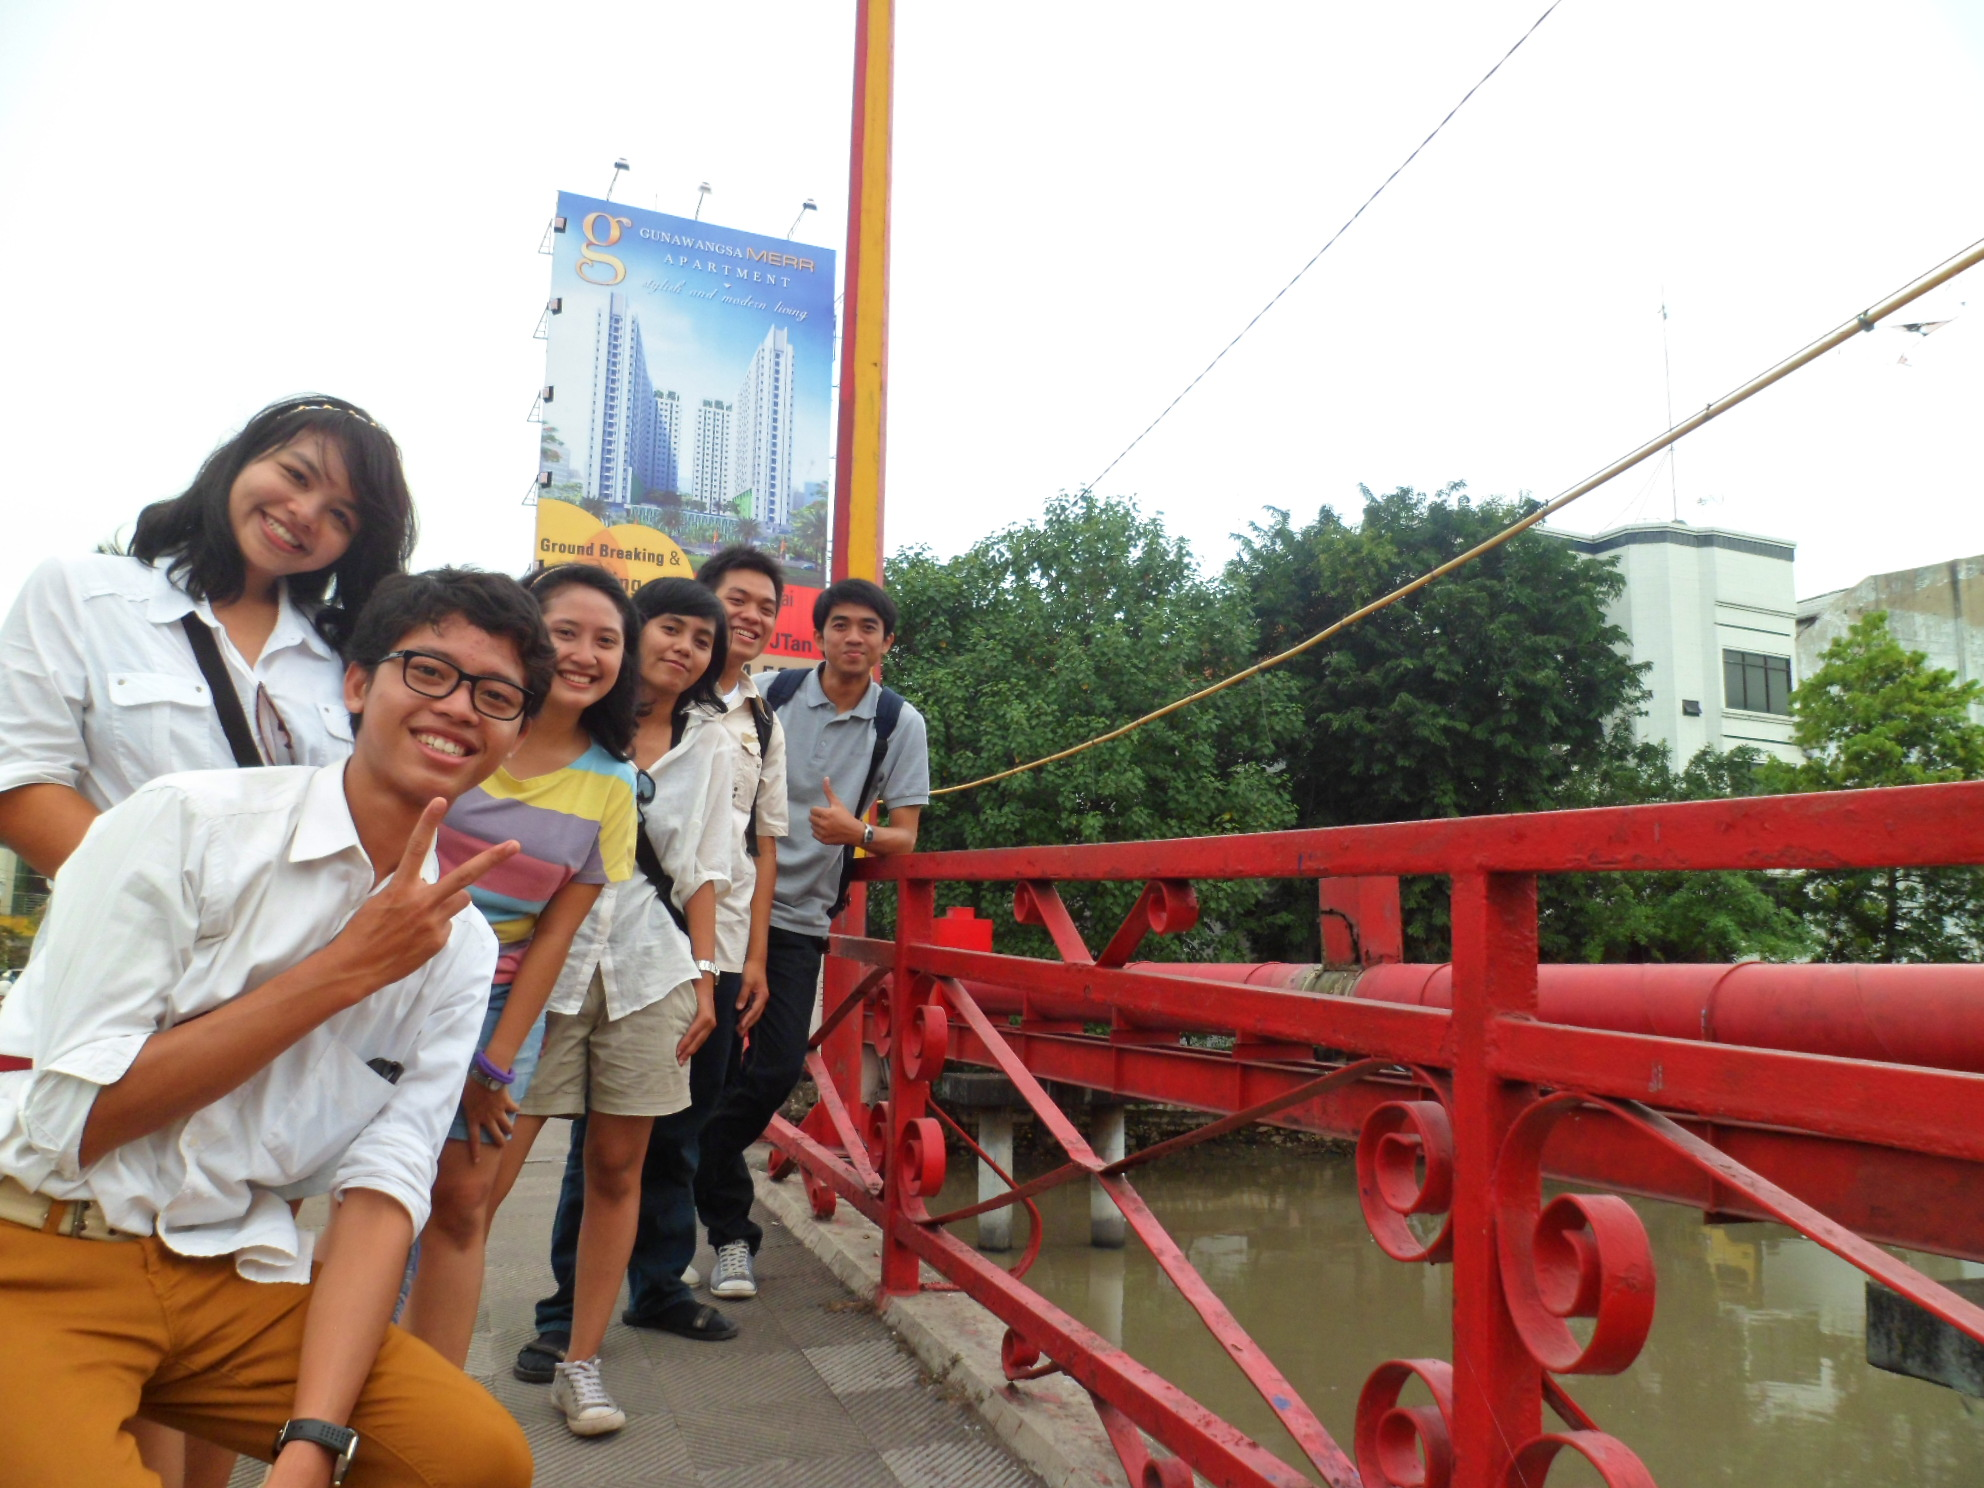 Journey West East City Heroes Arindiana Janidya Tempat Wisata Kece